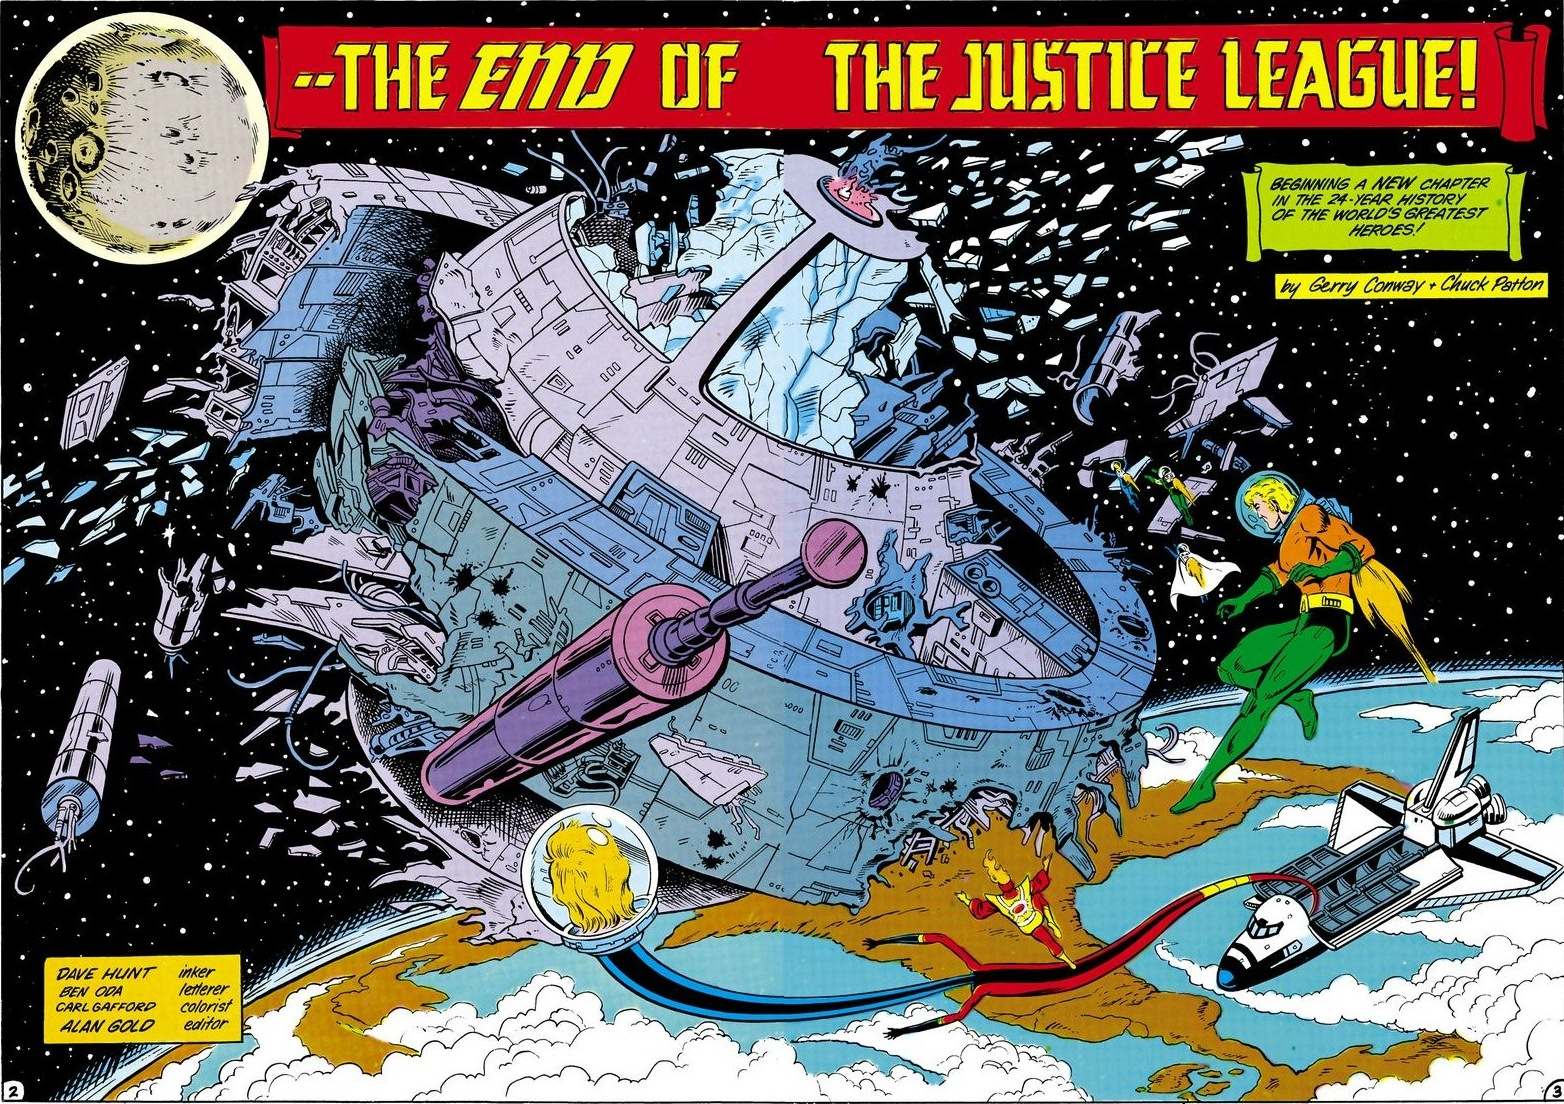 Justice-League-of-America-Annual-Vol.-1-2-1984